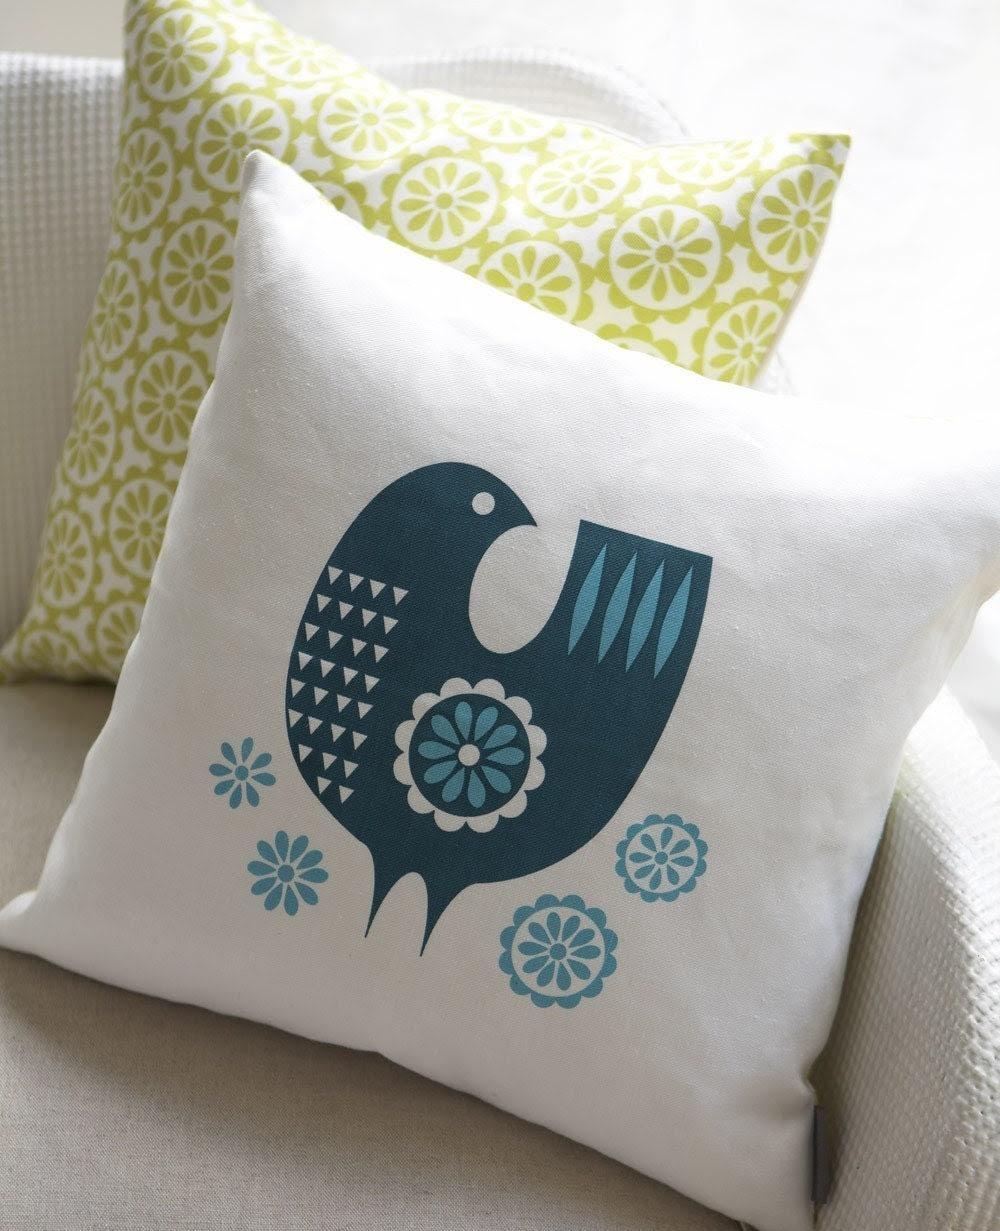 Daisy bird cushion in teal on white linen